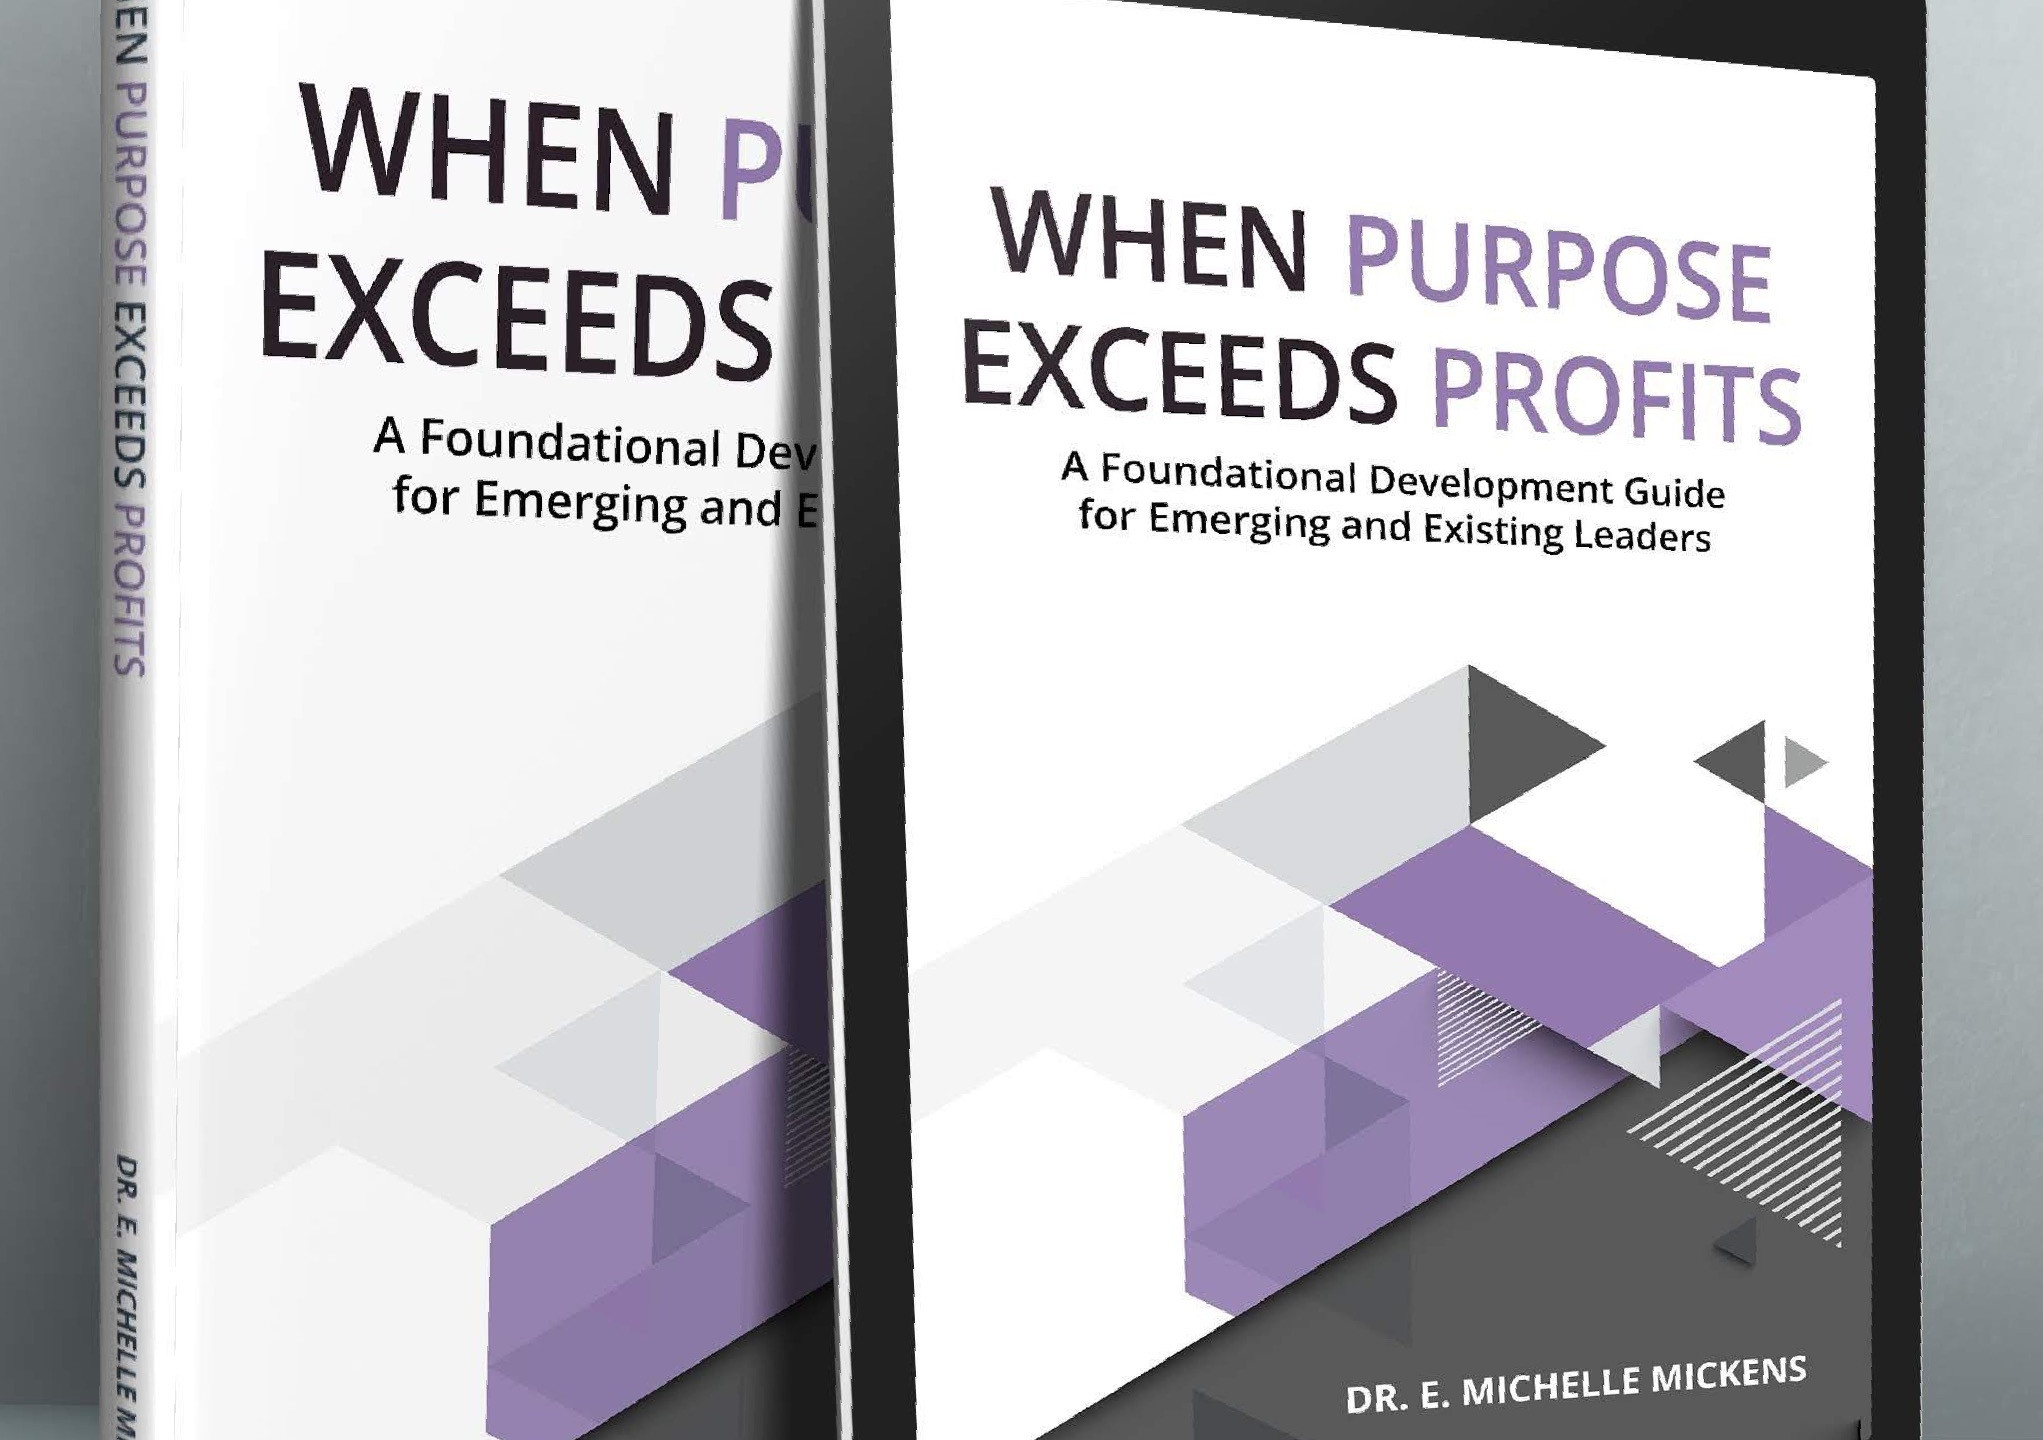 When Purpose Exceeds Profits